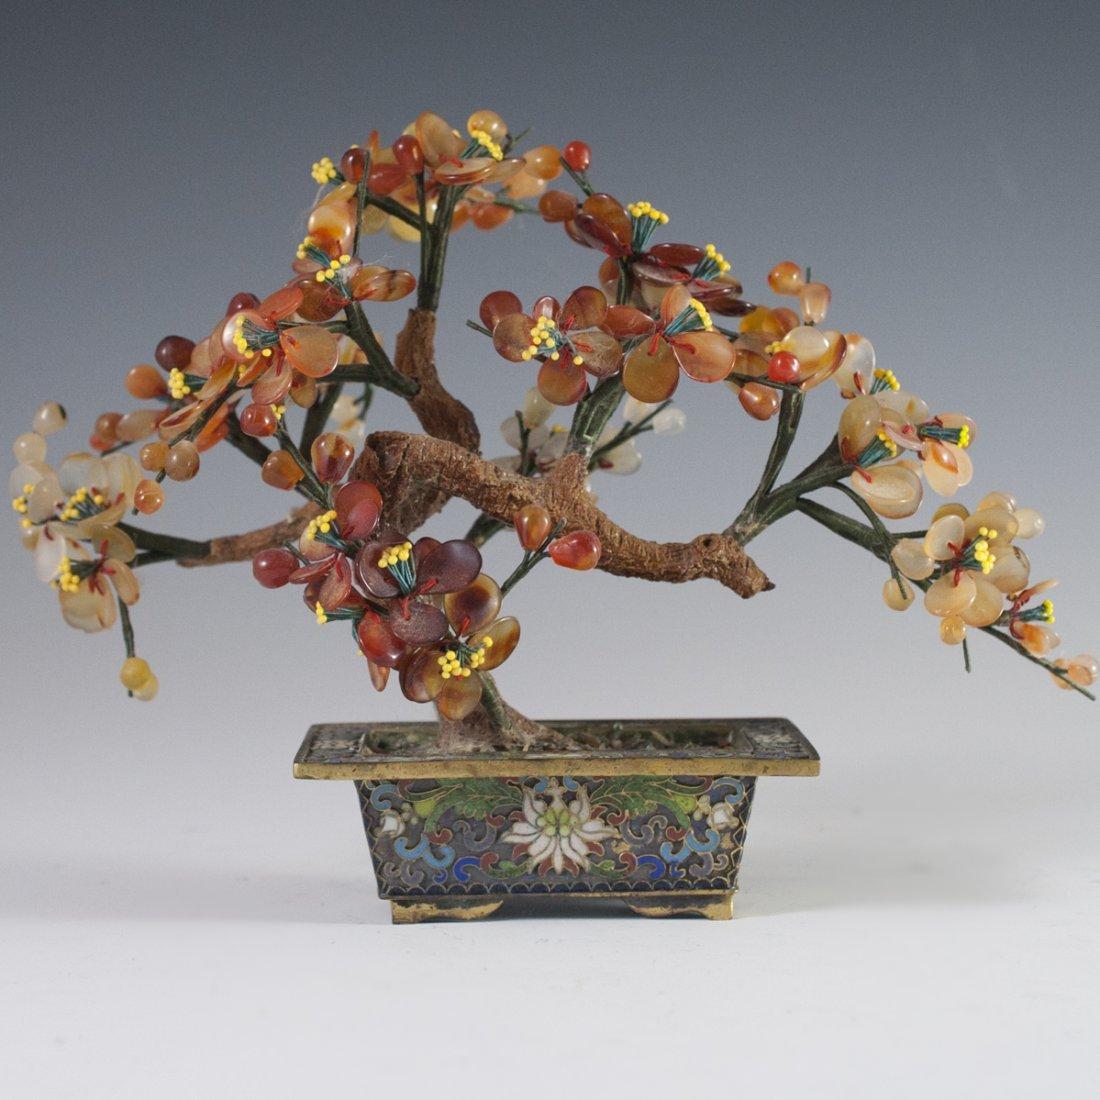 Chinese Enameled Cloissone Agate Bonsai Trees - 2